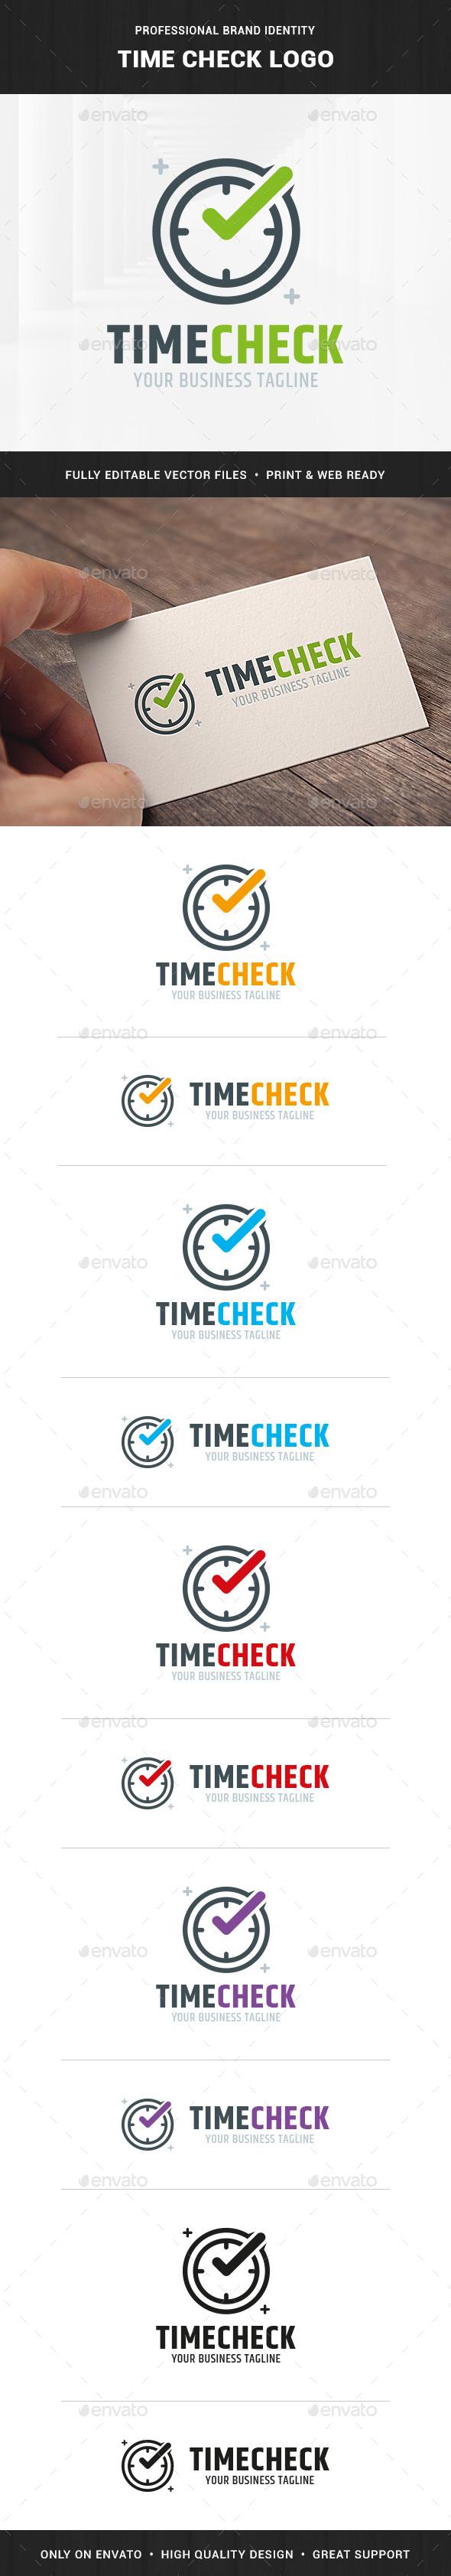 Time Check Logo Template